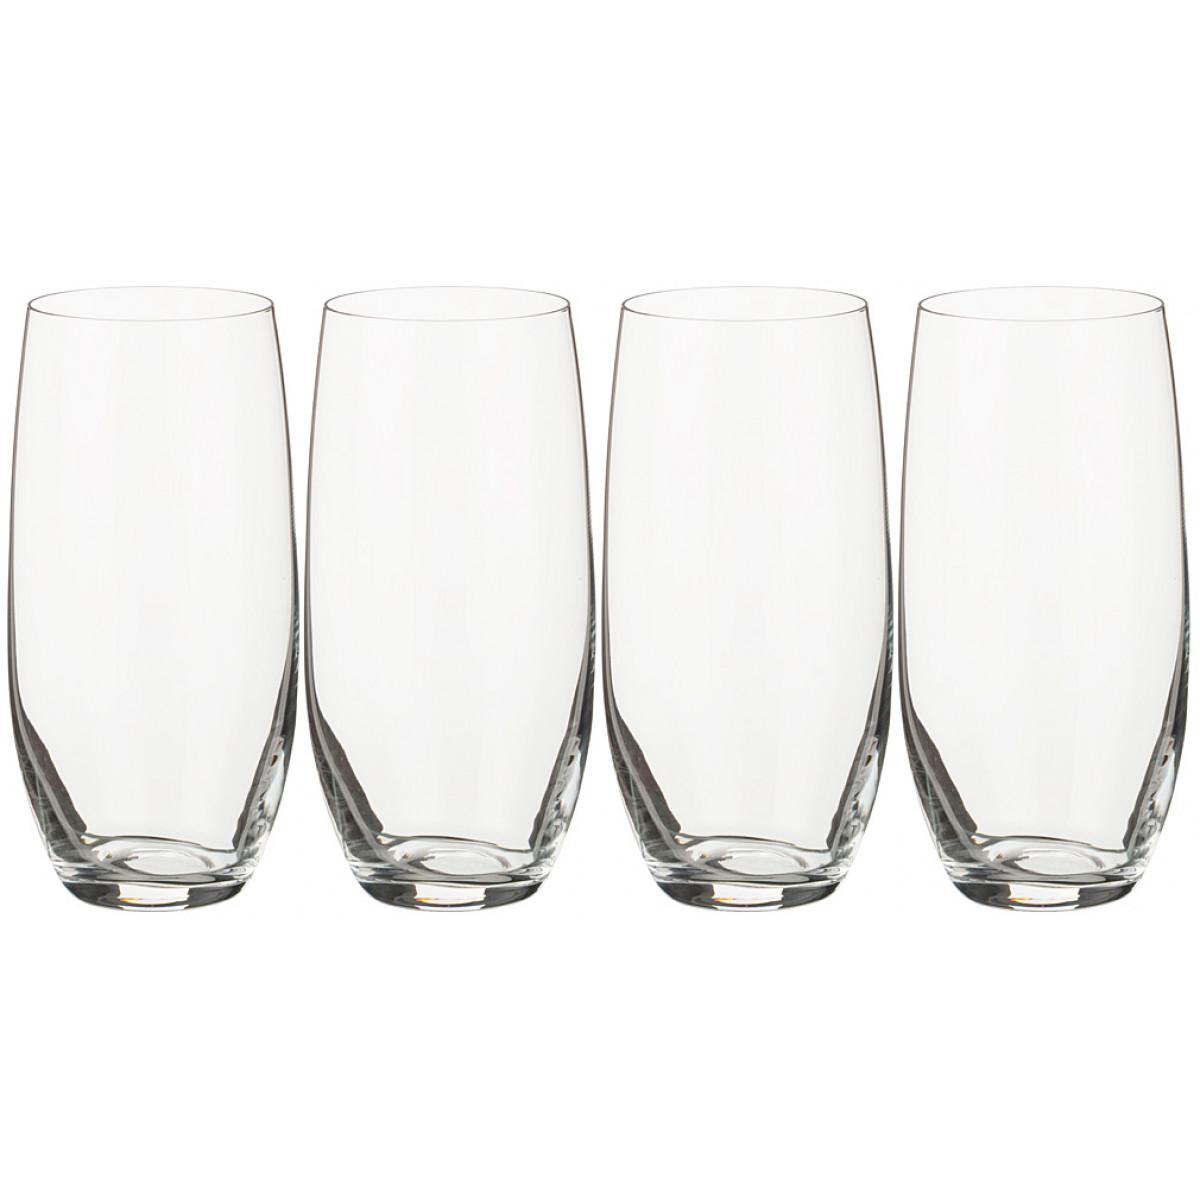 {} Bohemia Crystal Набор стаканов Marilena  (470 мл - 4 шт) набор для кофе crystal bohemia mokko 4 предмета